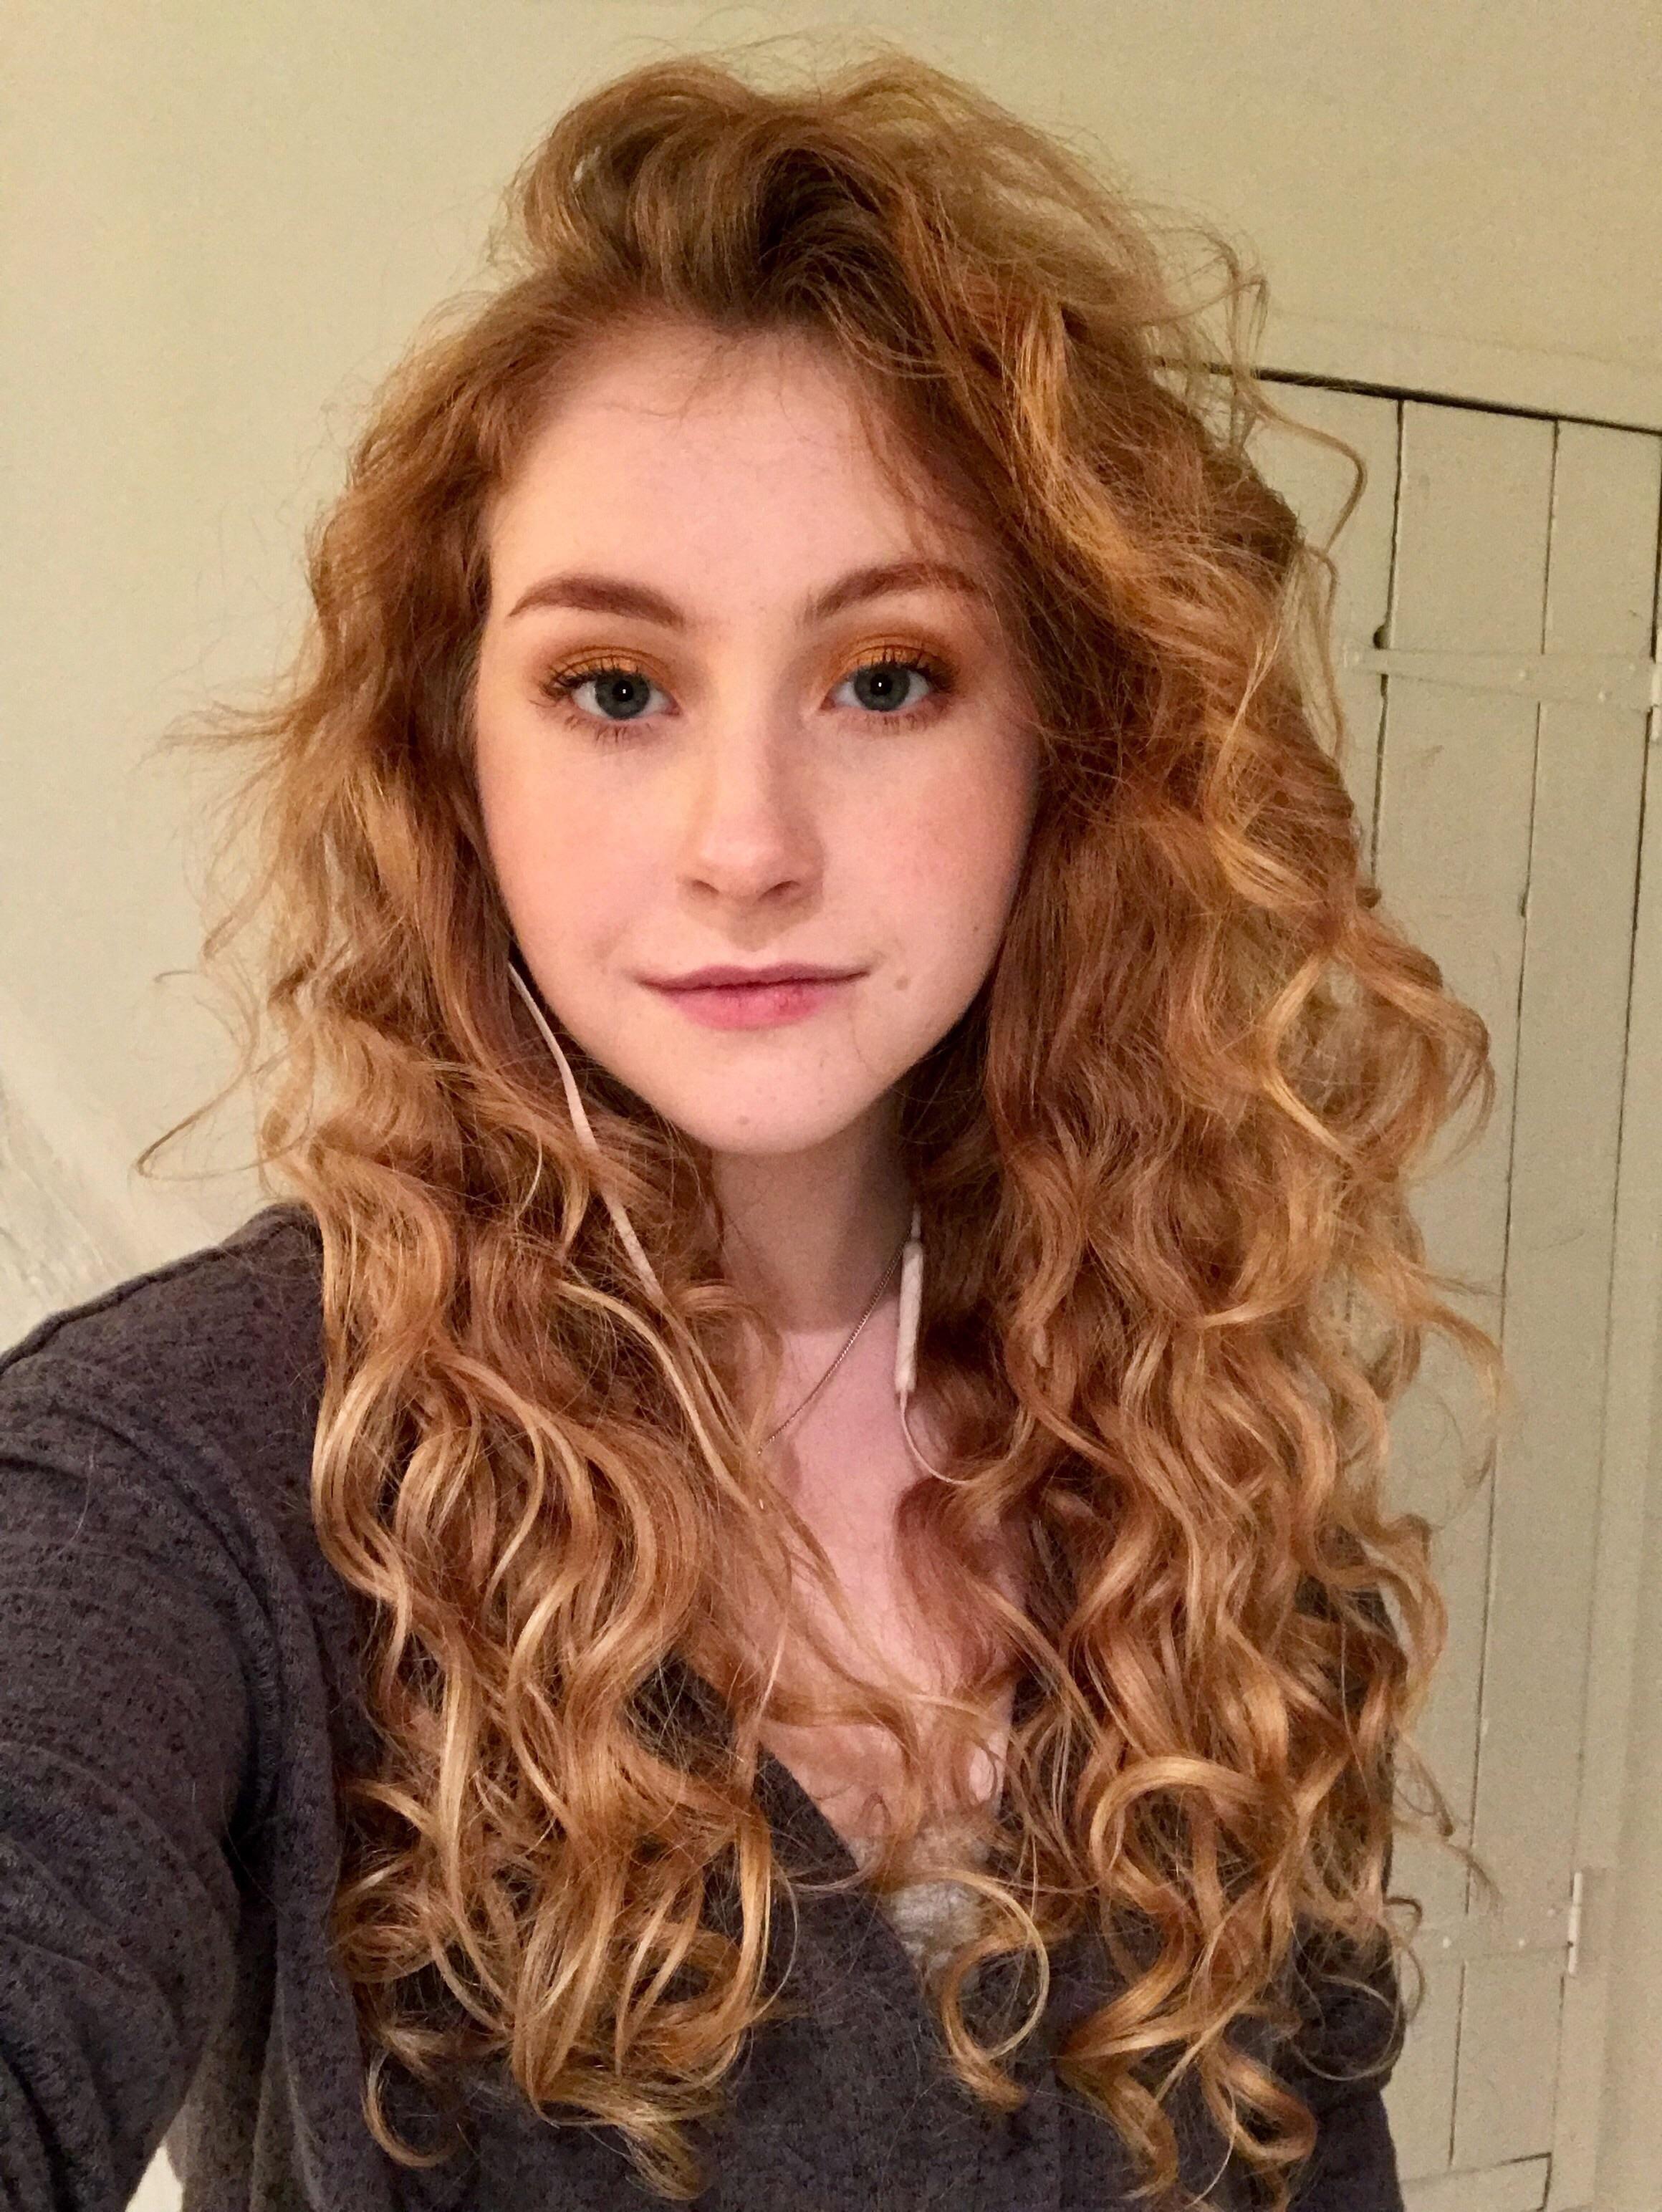 Hair Styling Clay Reddit